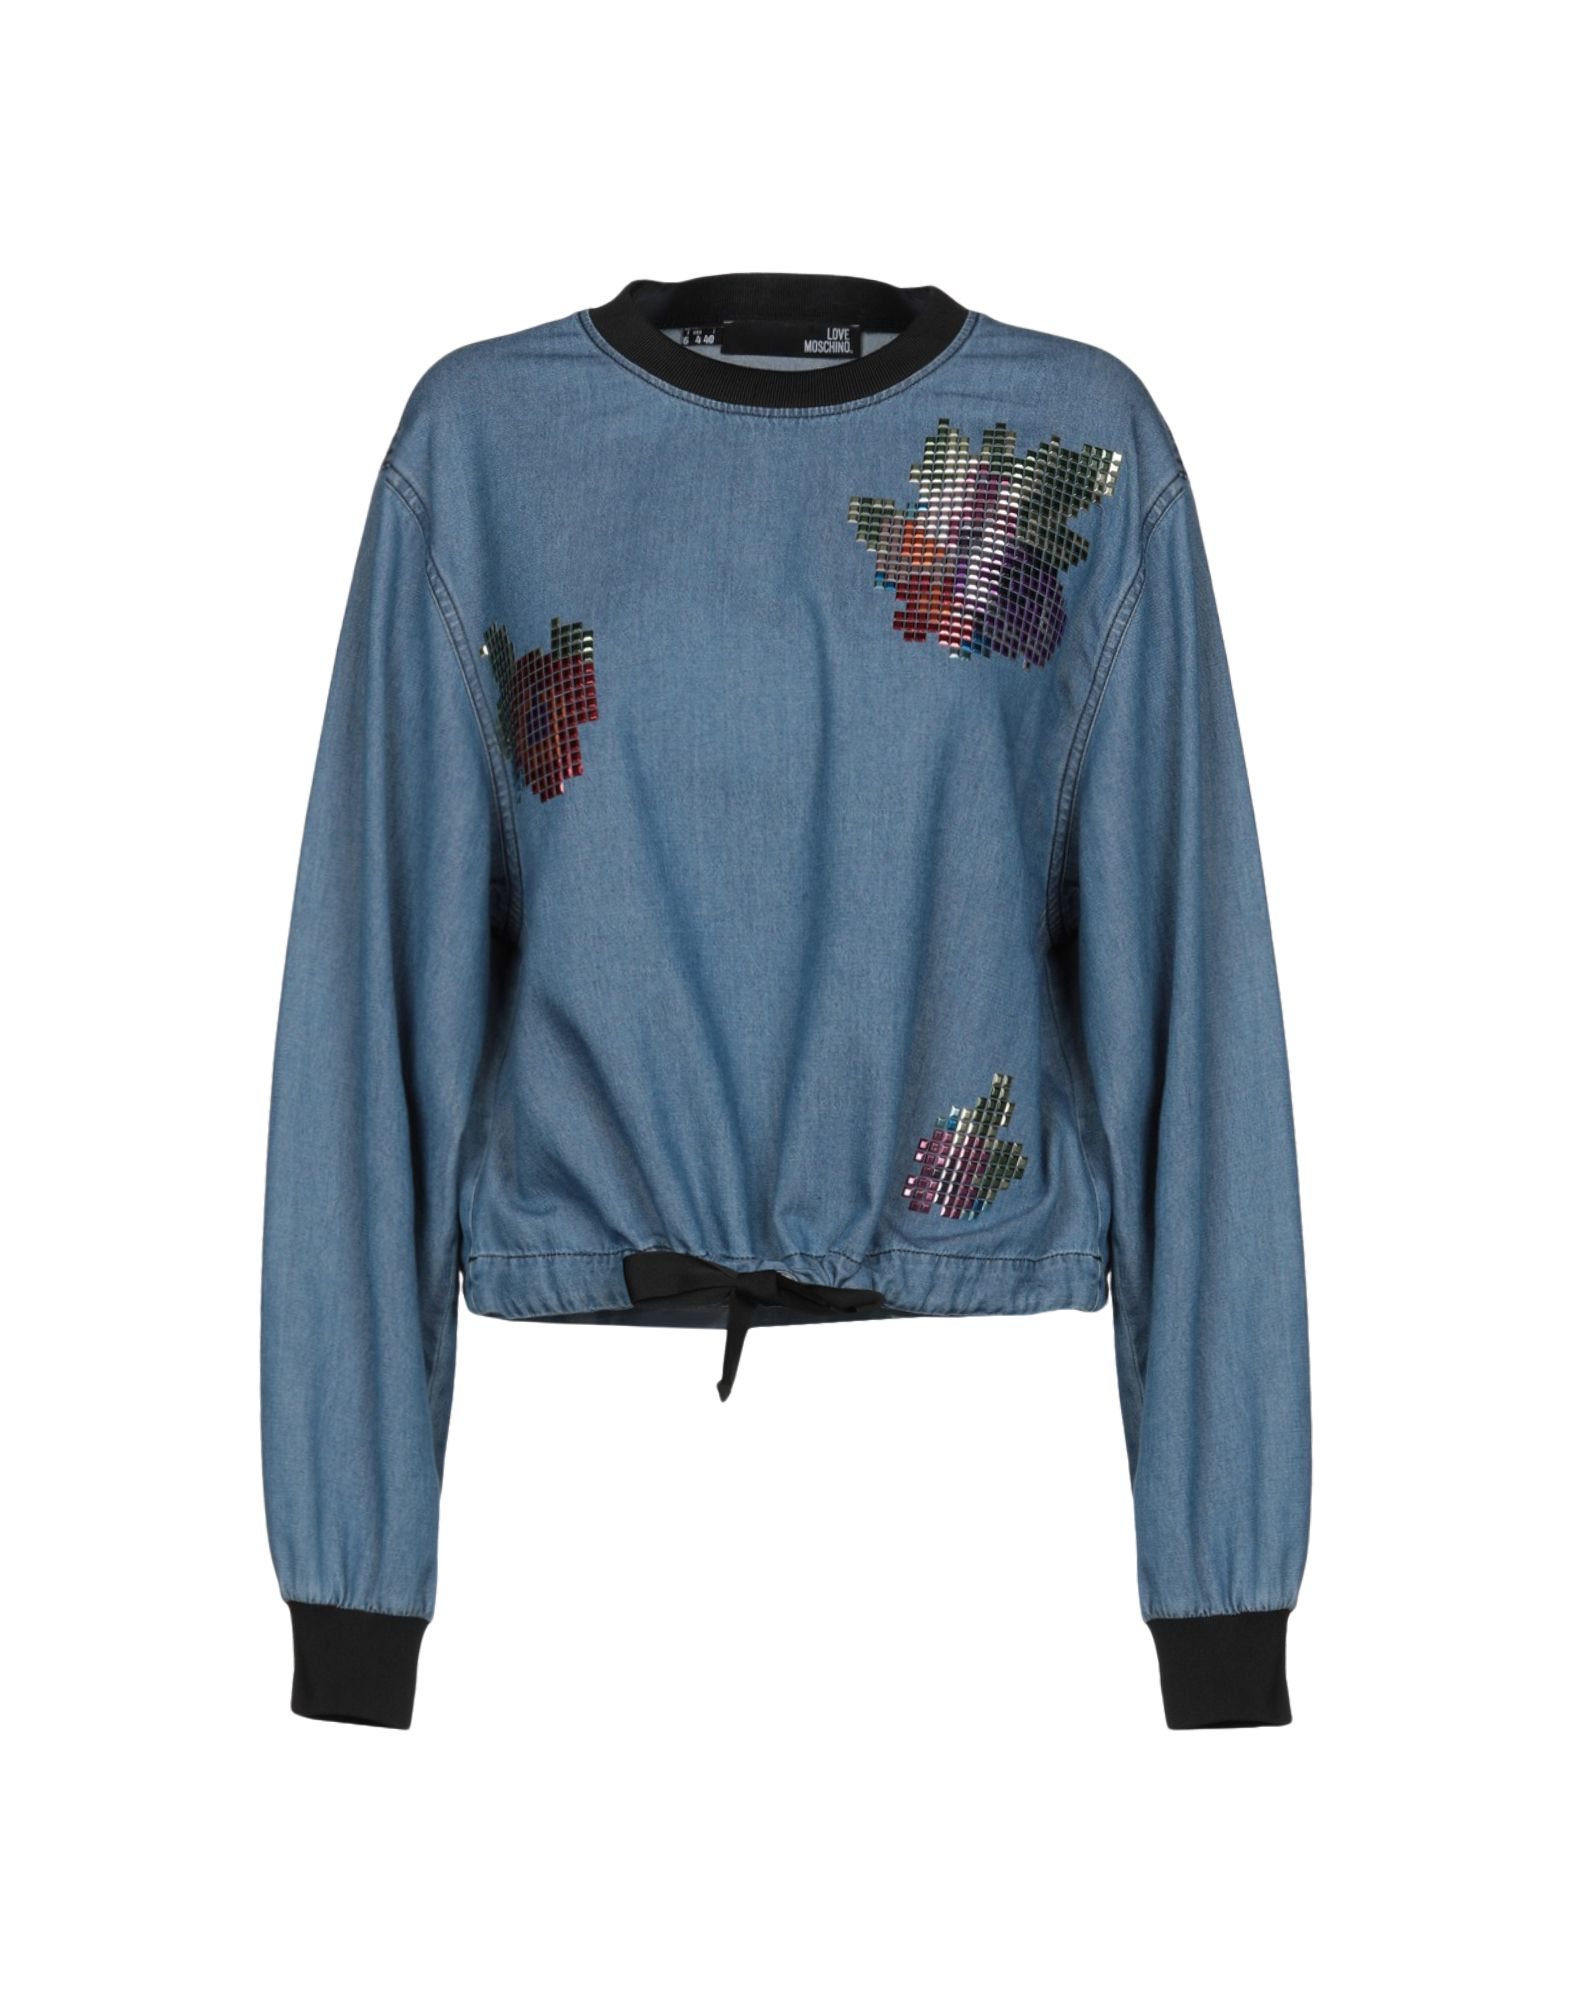 LOVE MOSCHINO Джинсовая рубашка рубашка джинсовая 3 12 лет